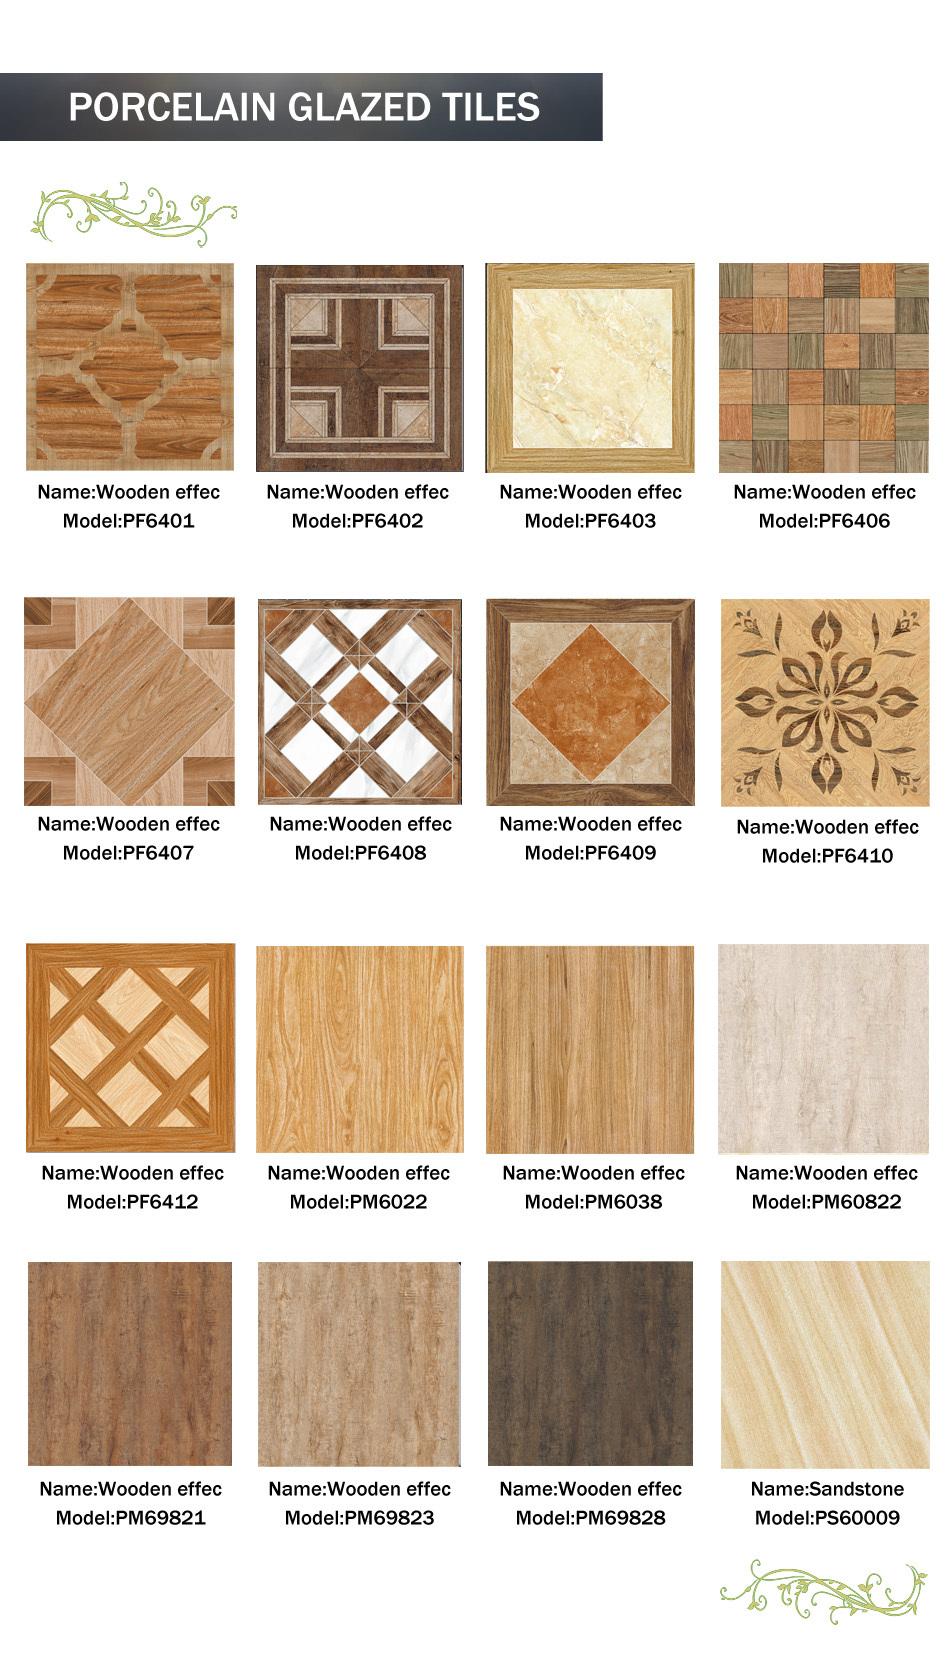 Bathroom glazed grain wood flooring tiles price view wood bathroom glazed grain wood flooring tiles price dailygadgetfo Gallery